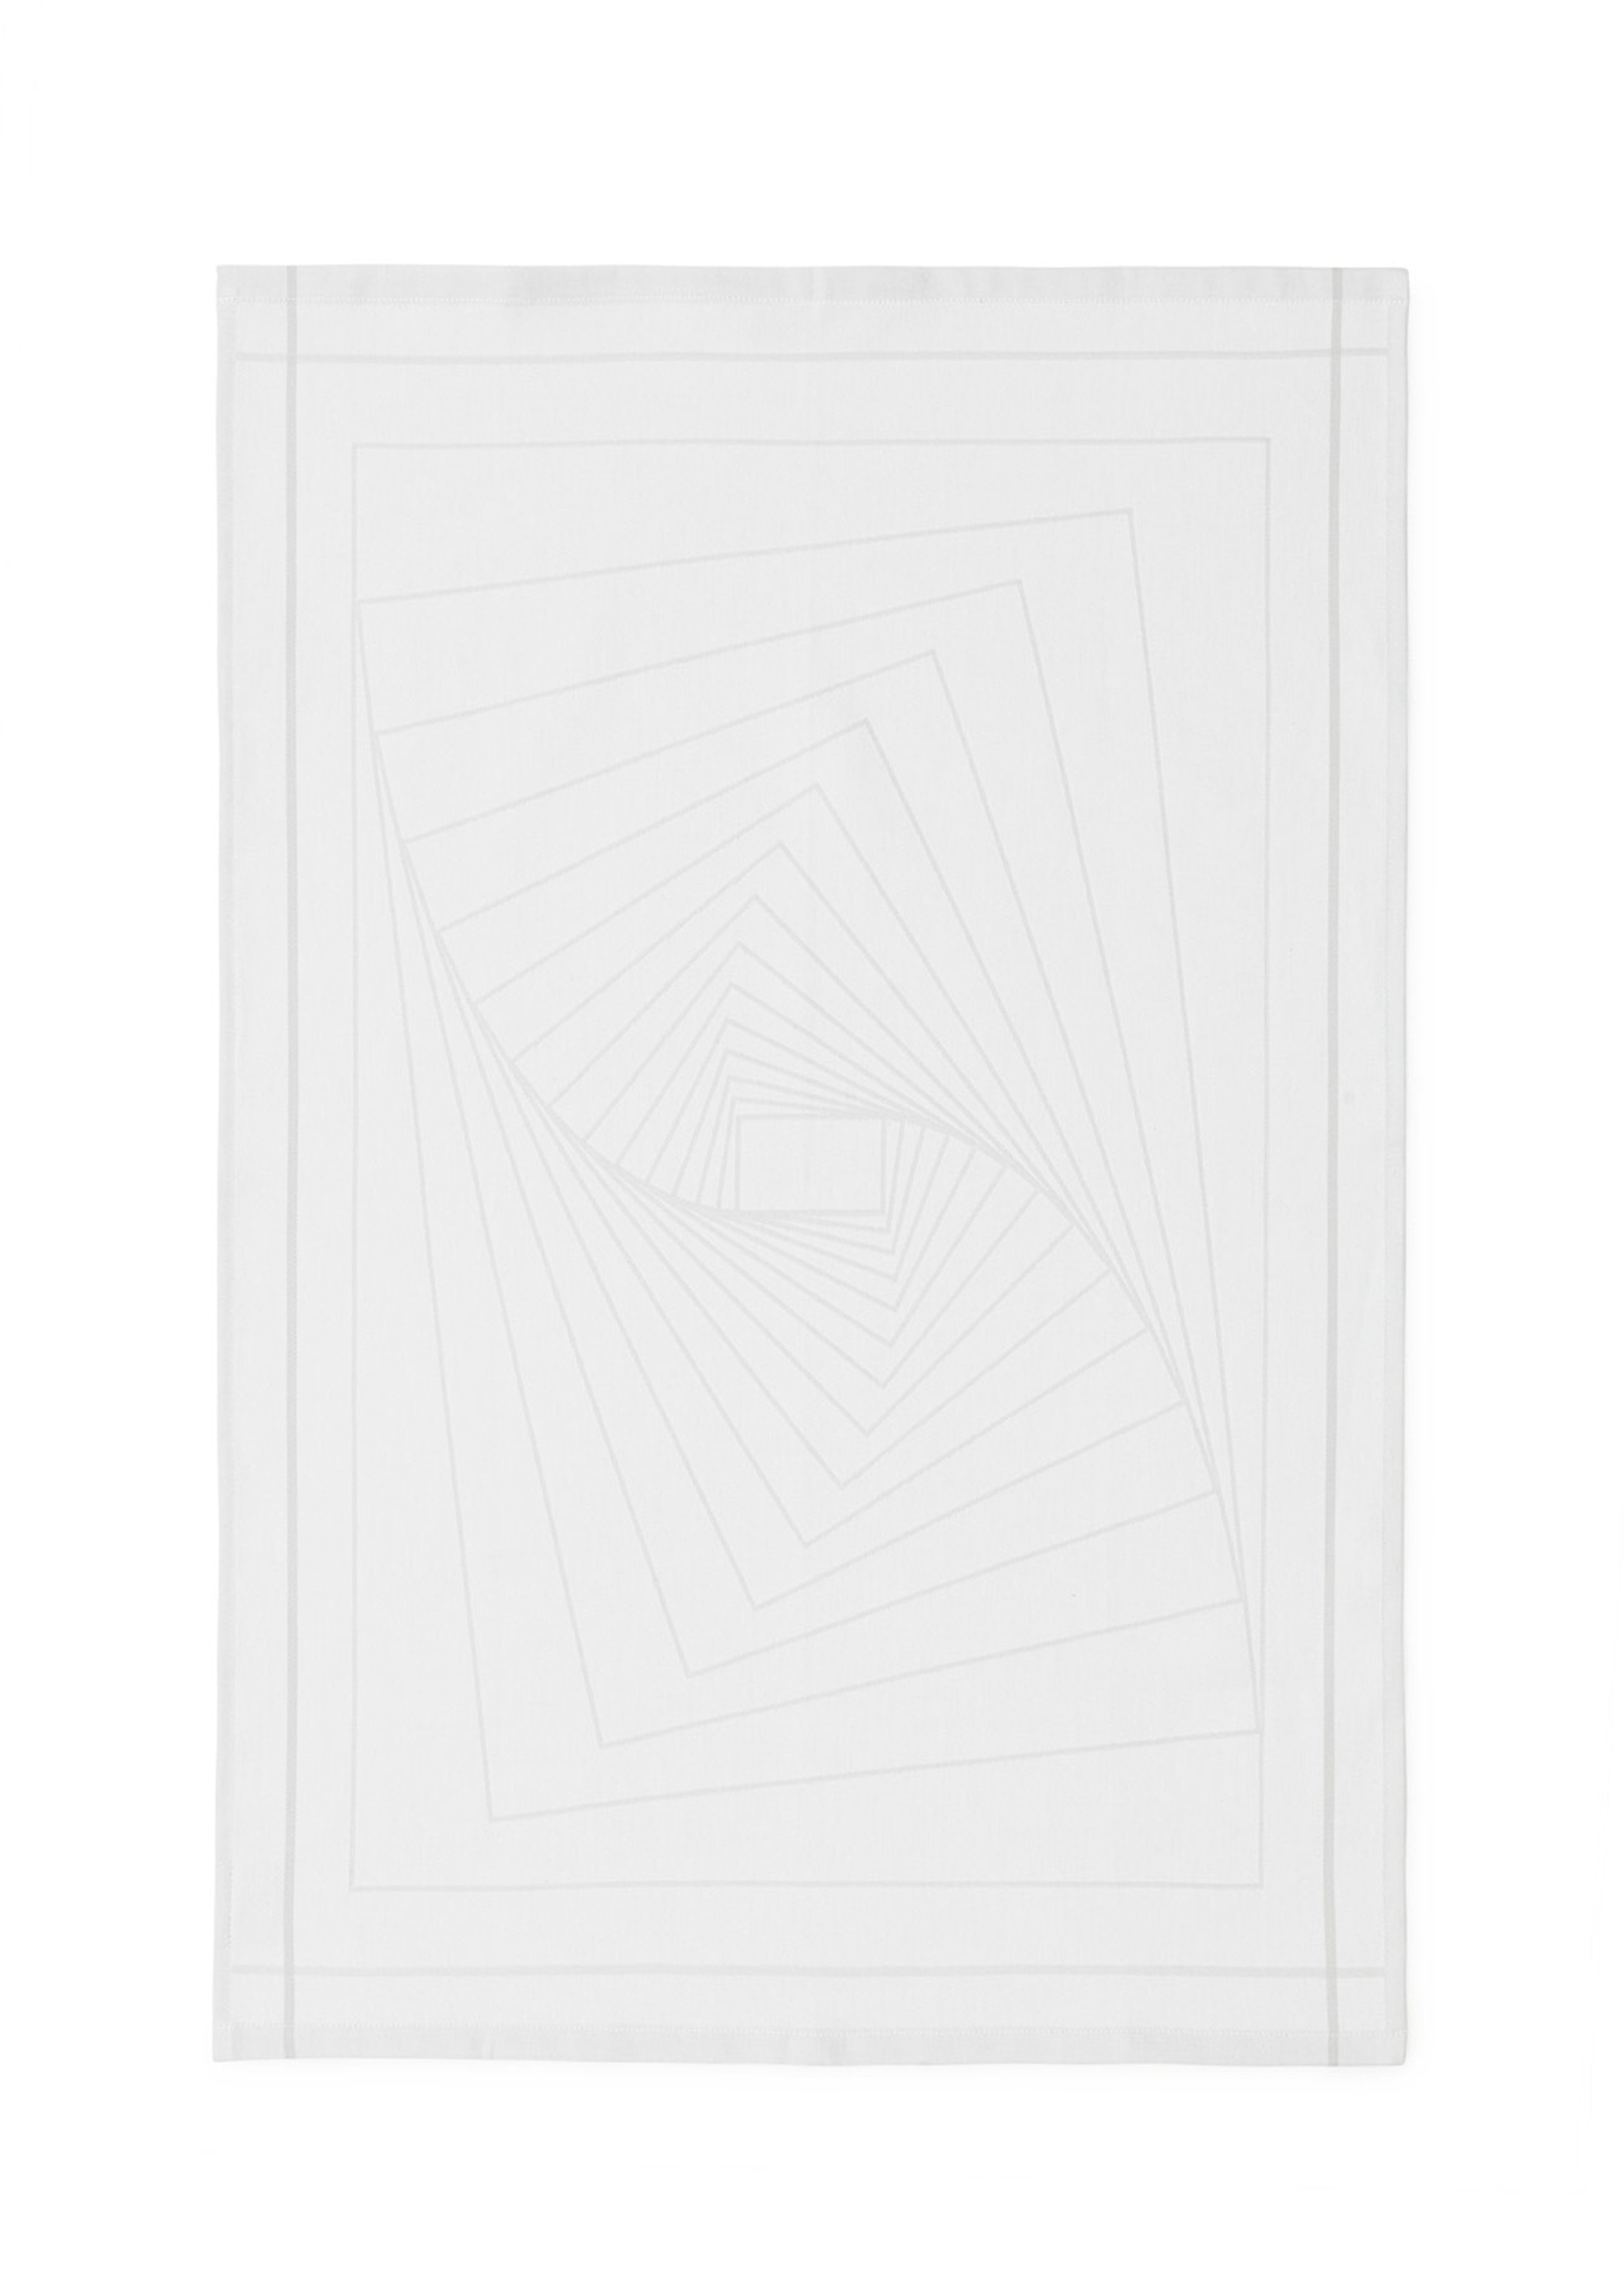 Image of   Illusion Tea Towel